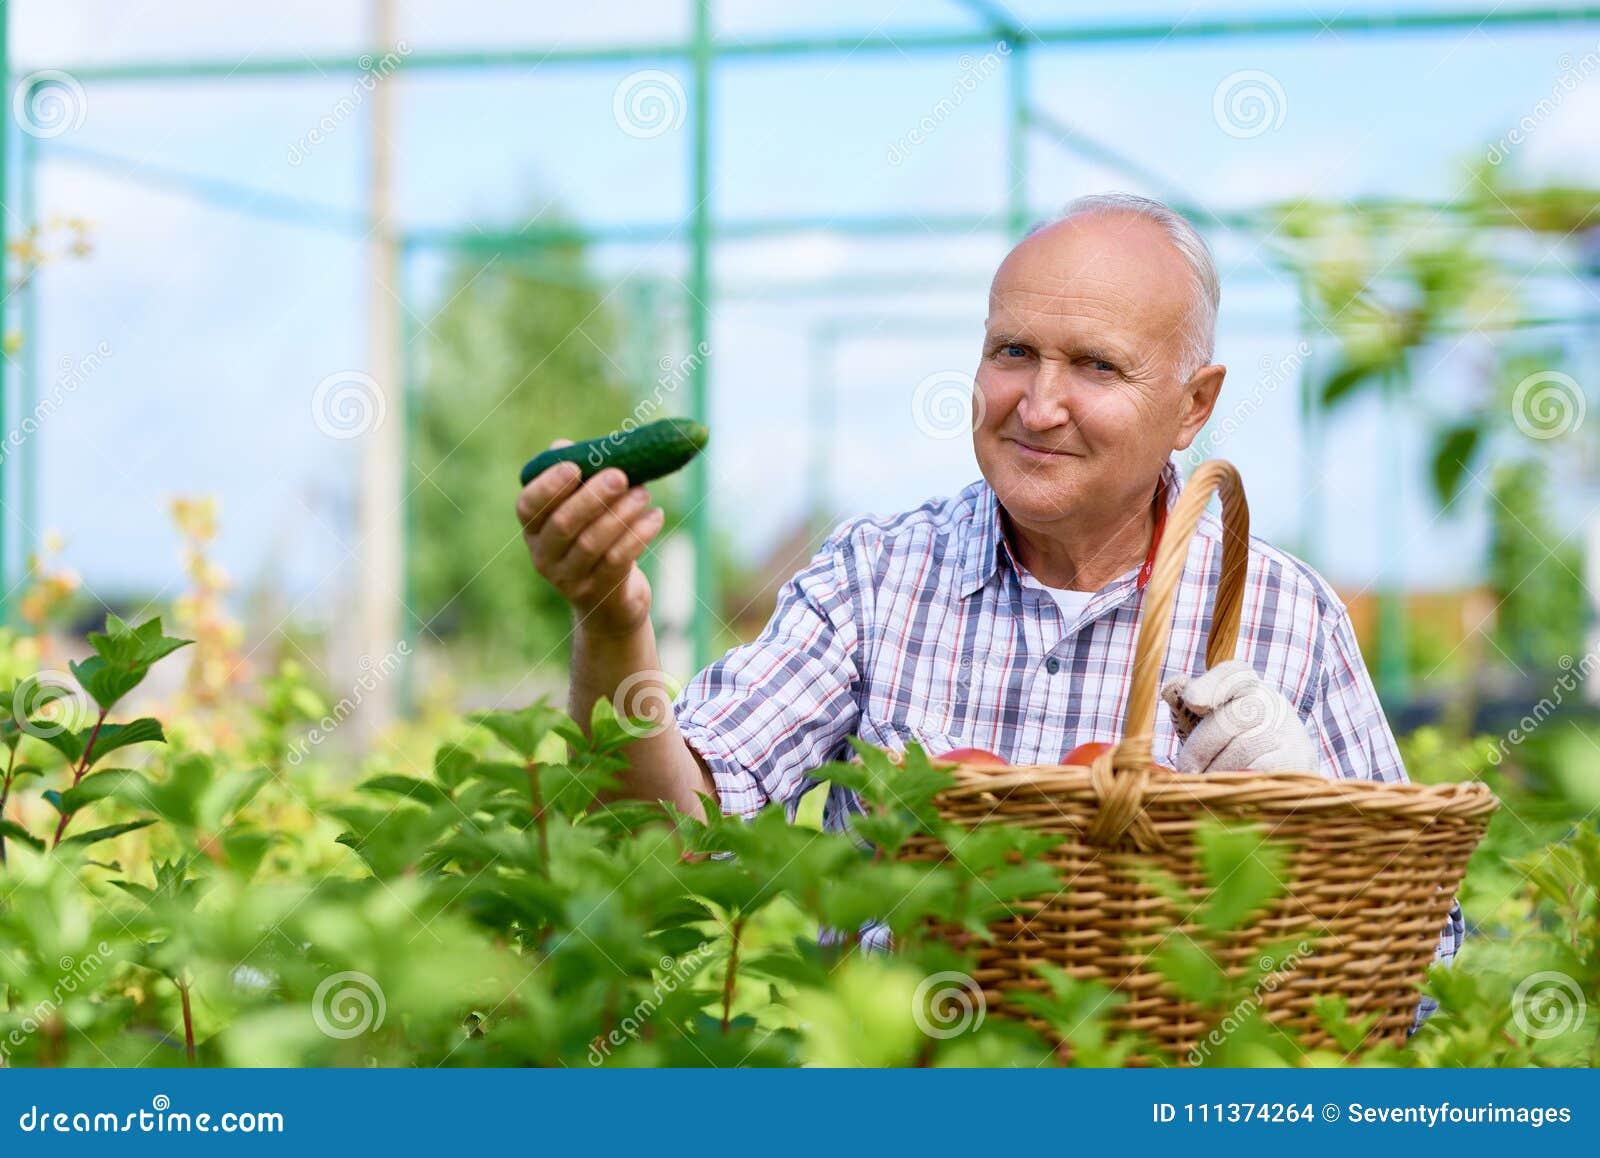 Fazendeiro orgulhoso Presenting Ripe Cucumbers